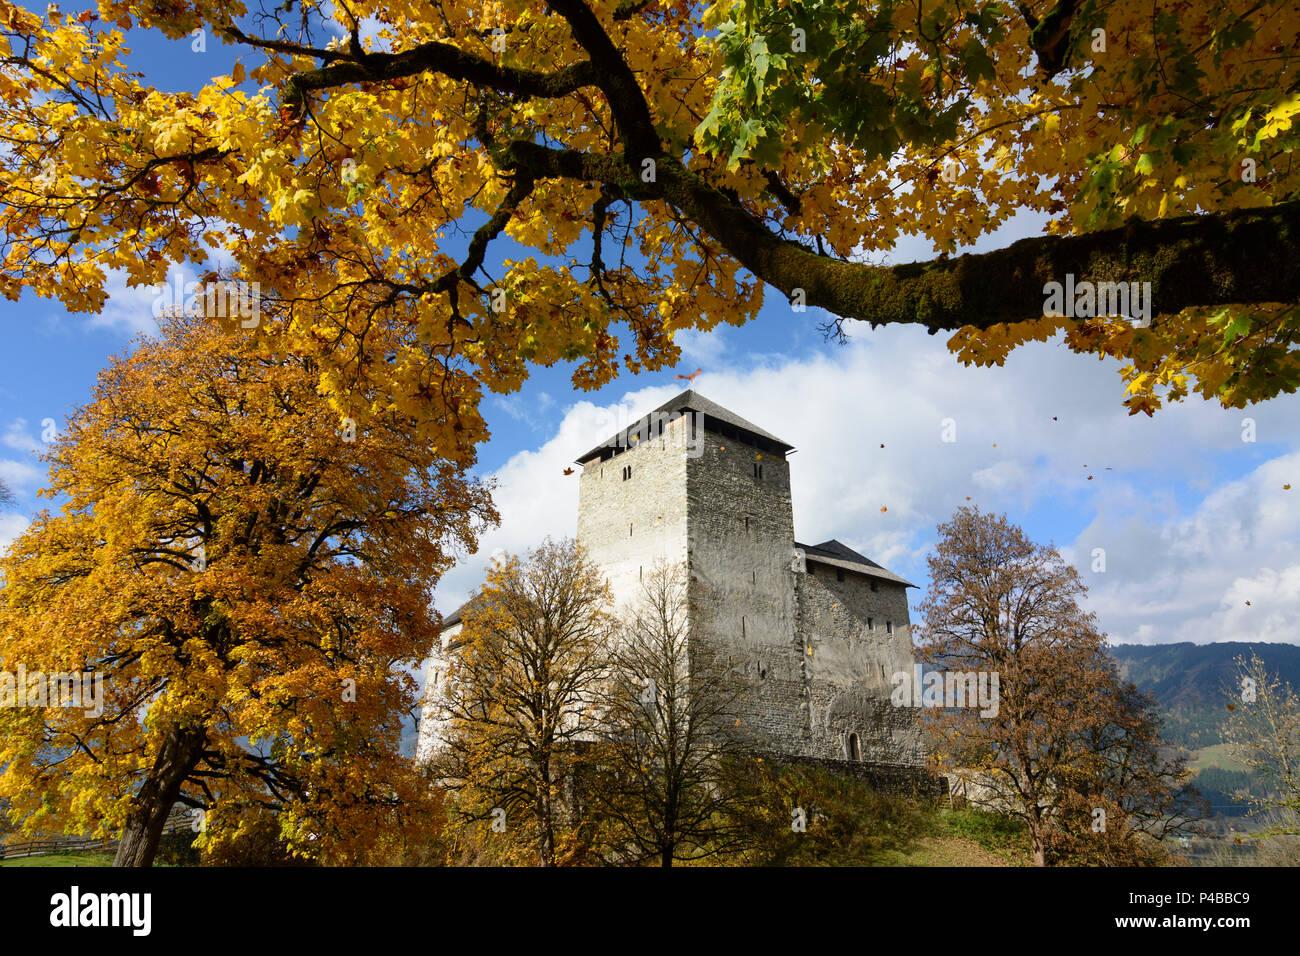 Kaprun, Kaprun Castle, maple trees, Pinzgau, Salzburg, Austria Stock Photo